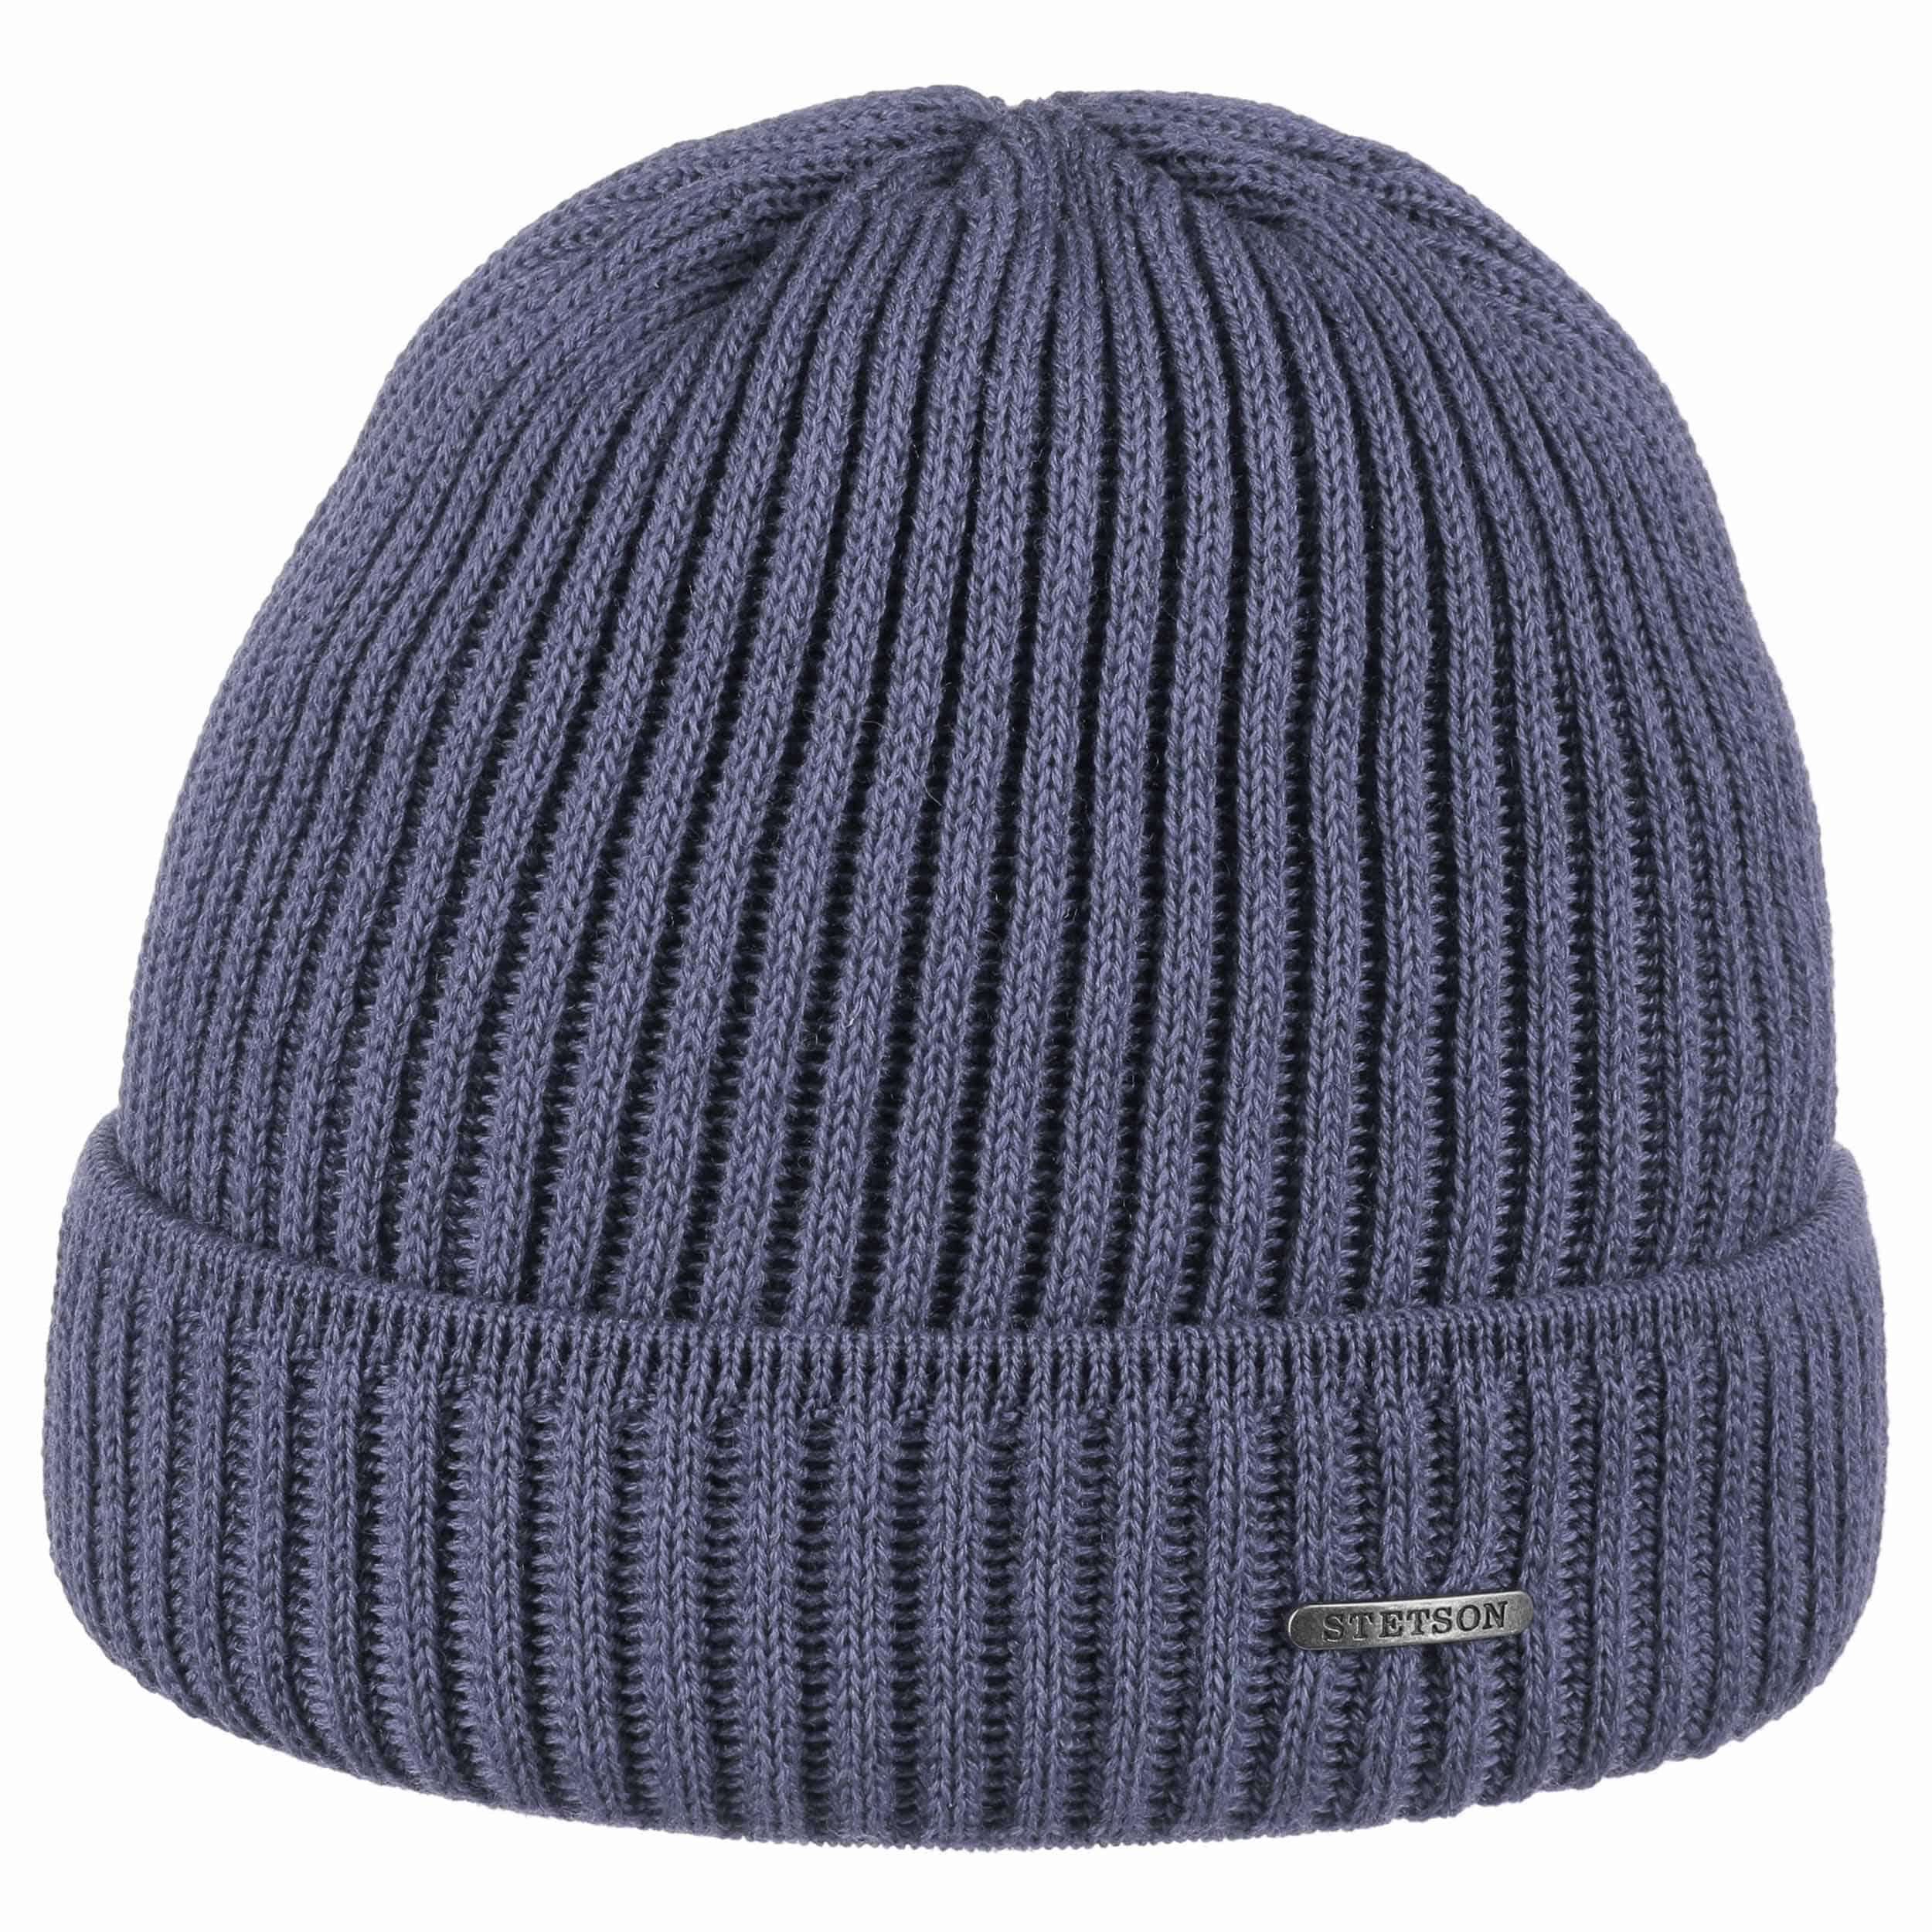 ... Parkman Knit Hat by Stetson - denim 3 ... 8949594cdf7